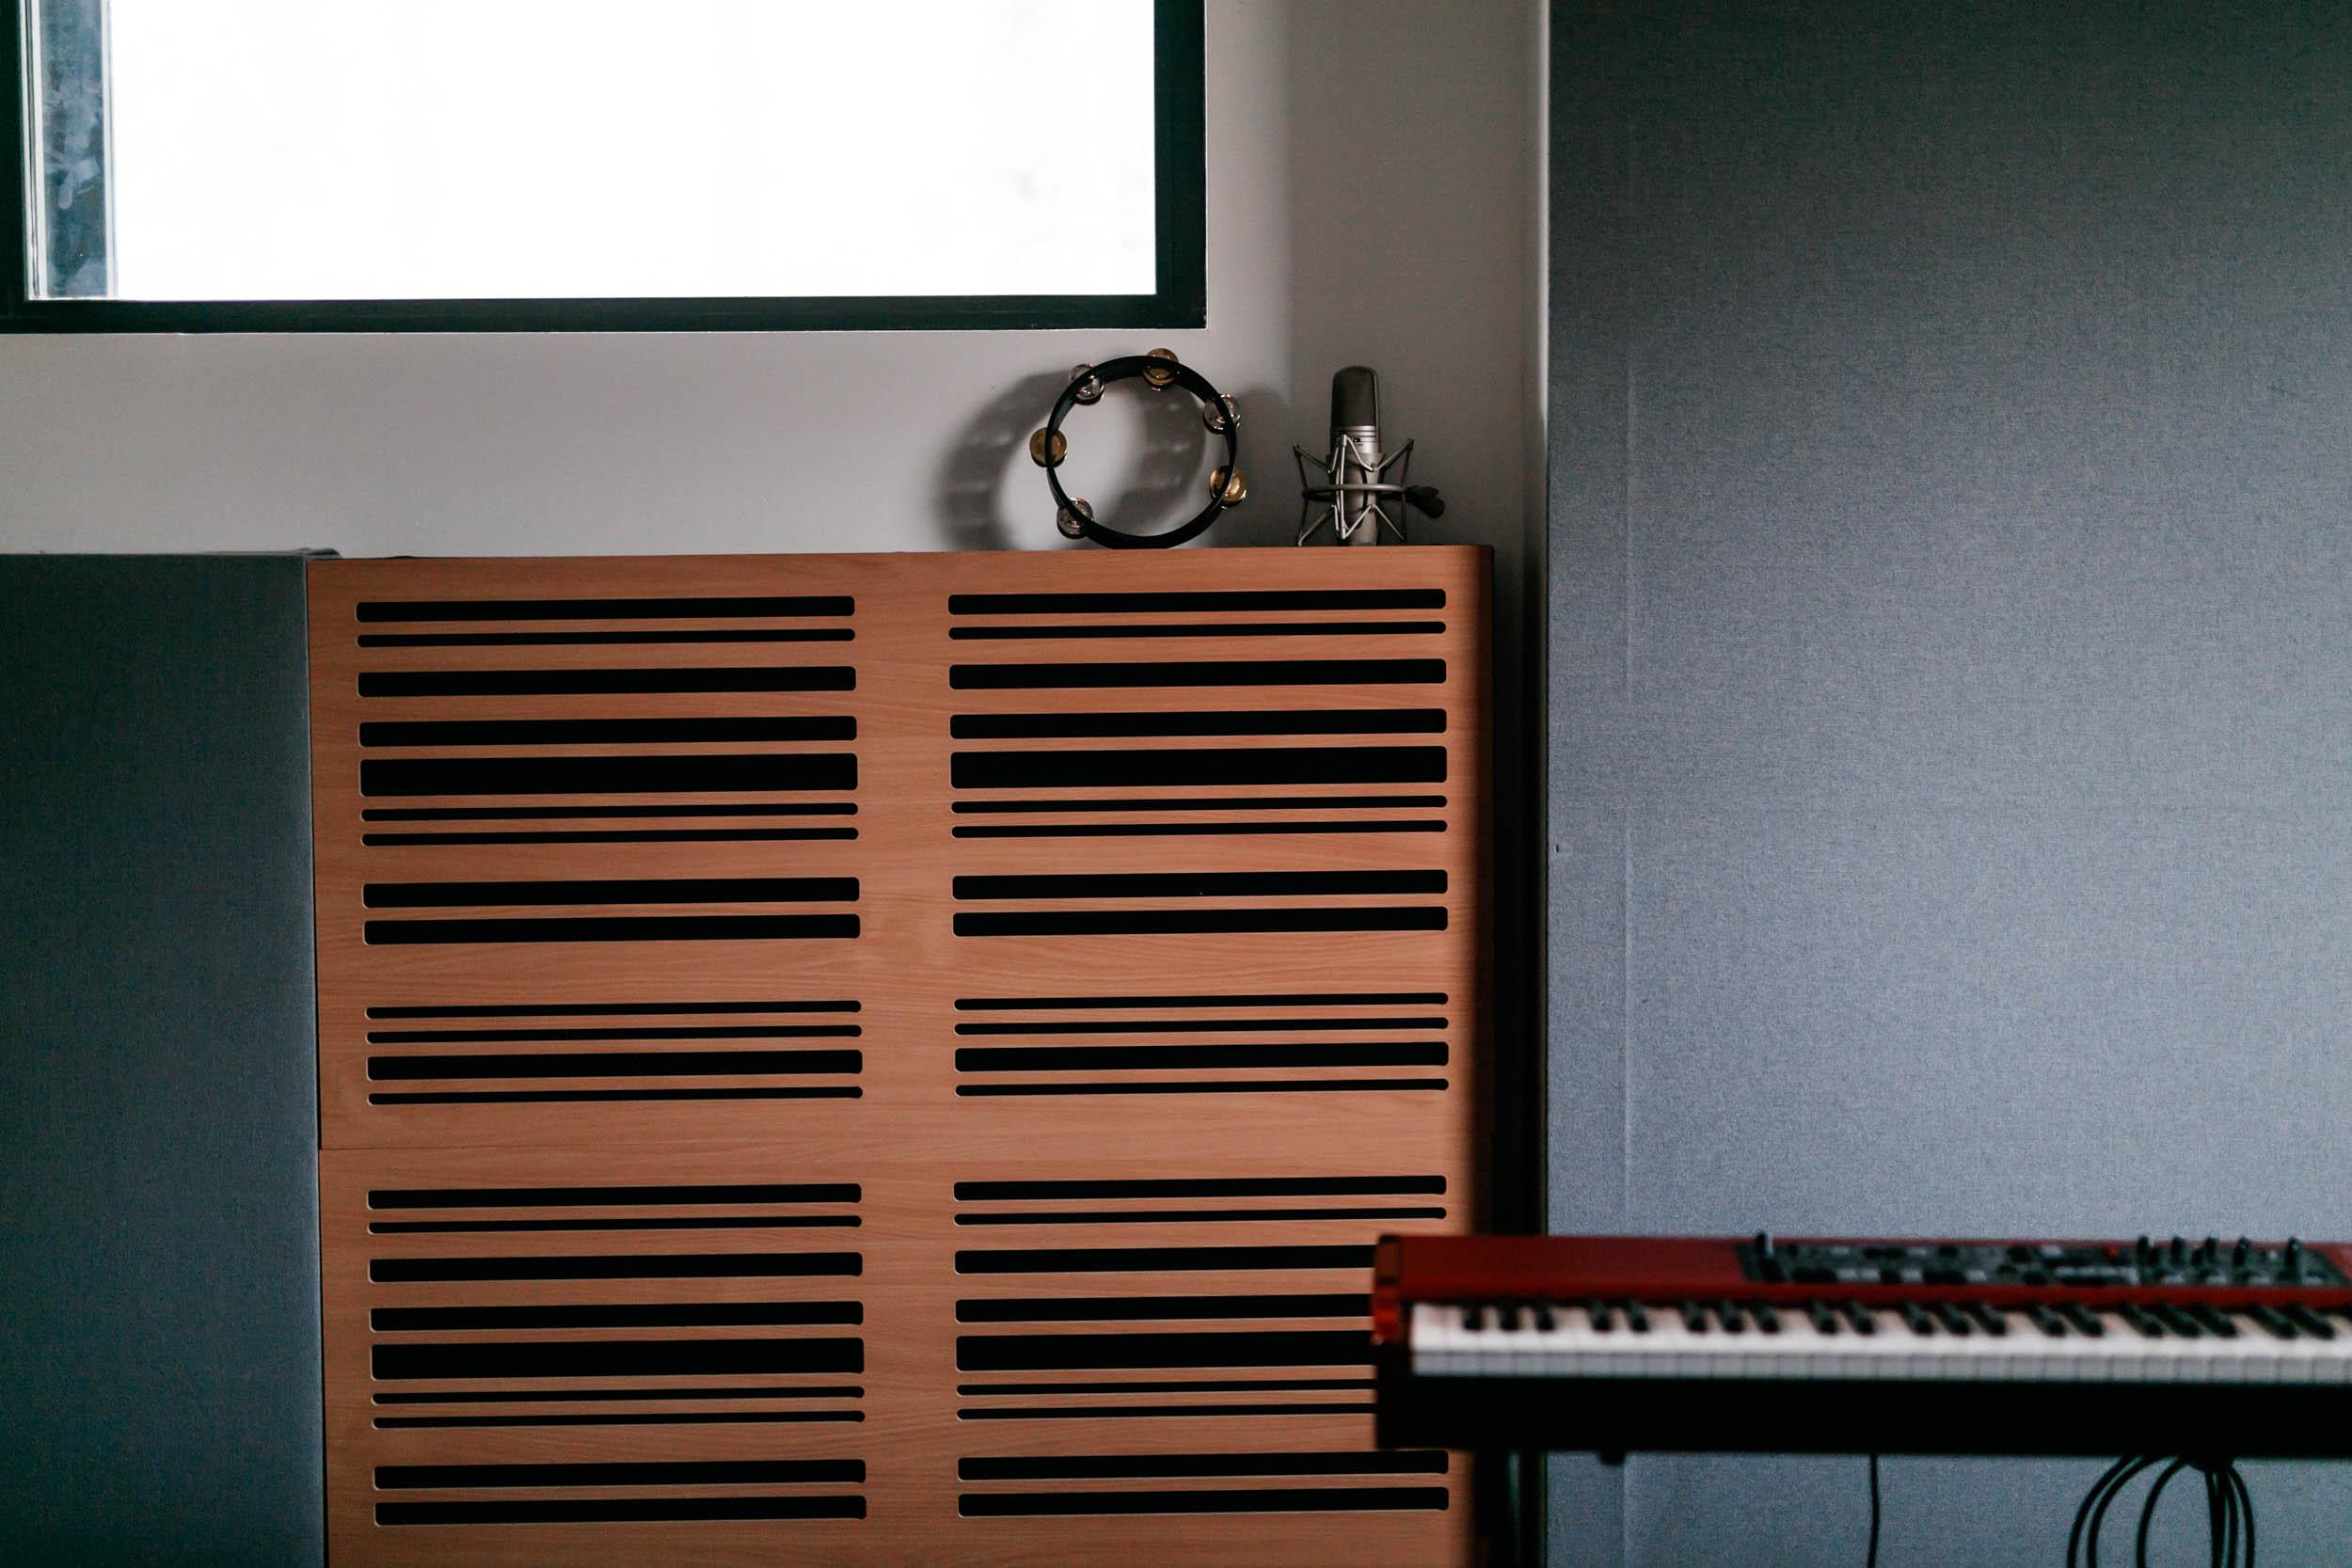 wavefield-recording-studio-0J4A0063.jpg